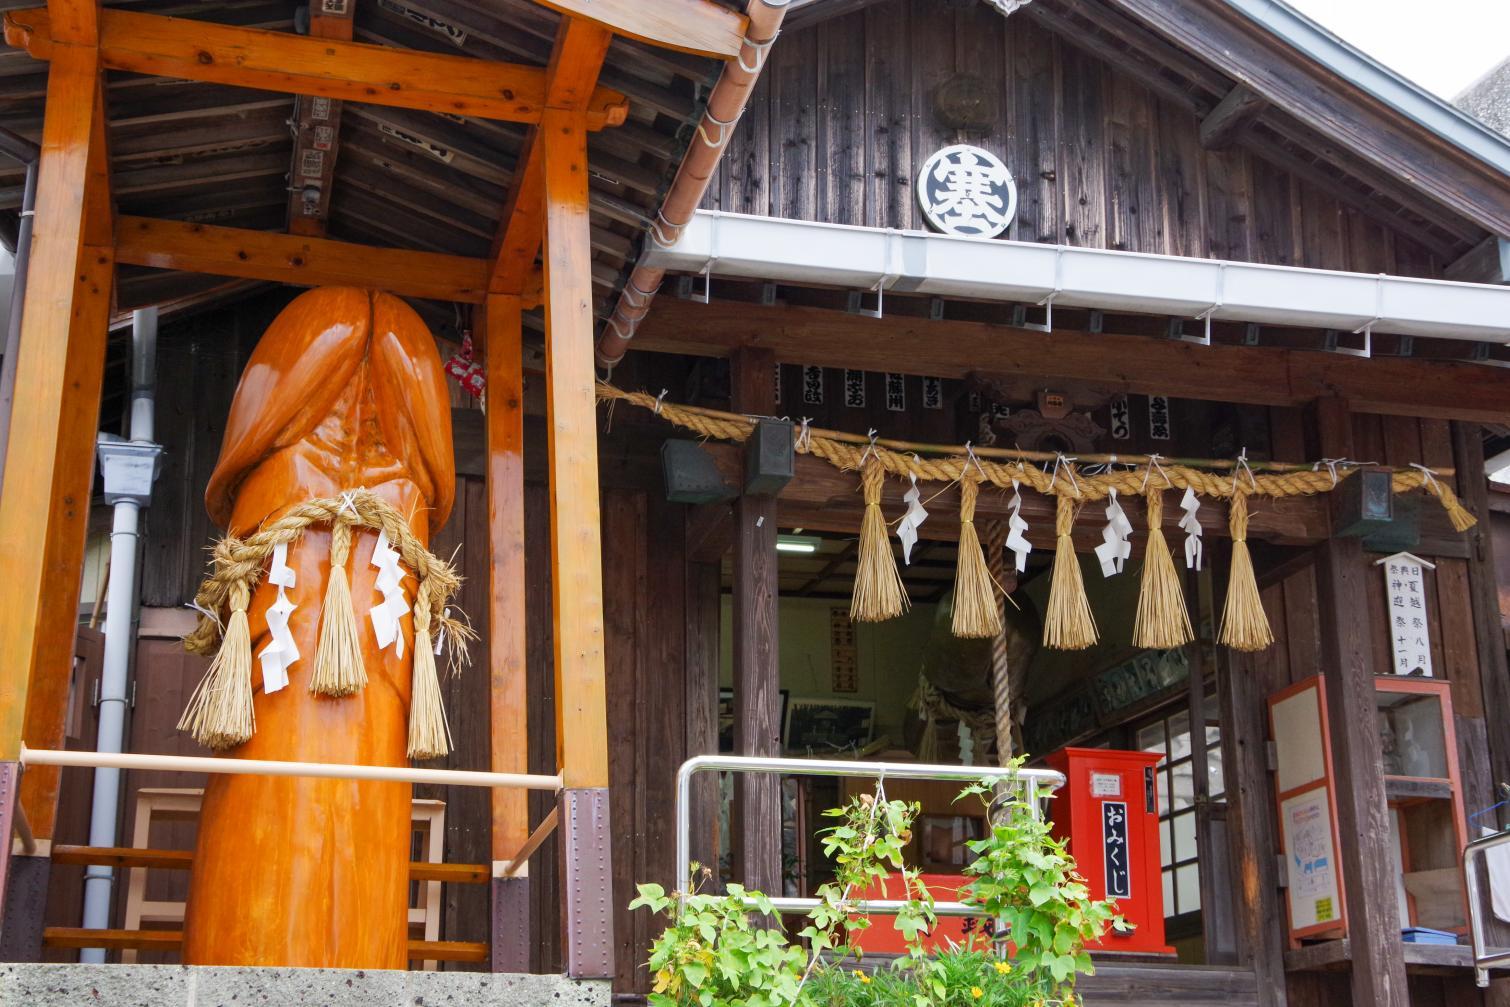 Sai Shrine: A fertility shrine dedicated to marriage and easy childbirth.-2